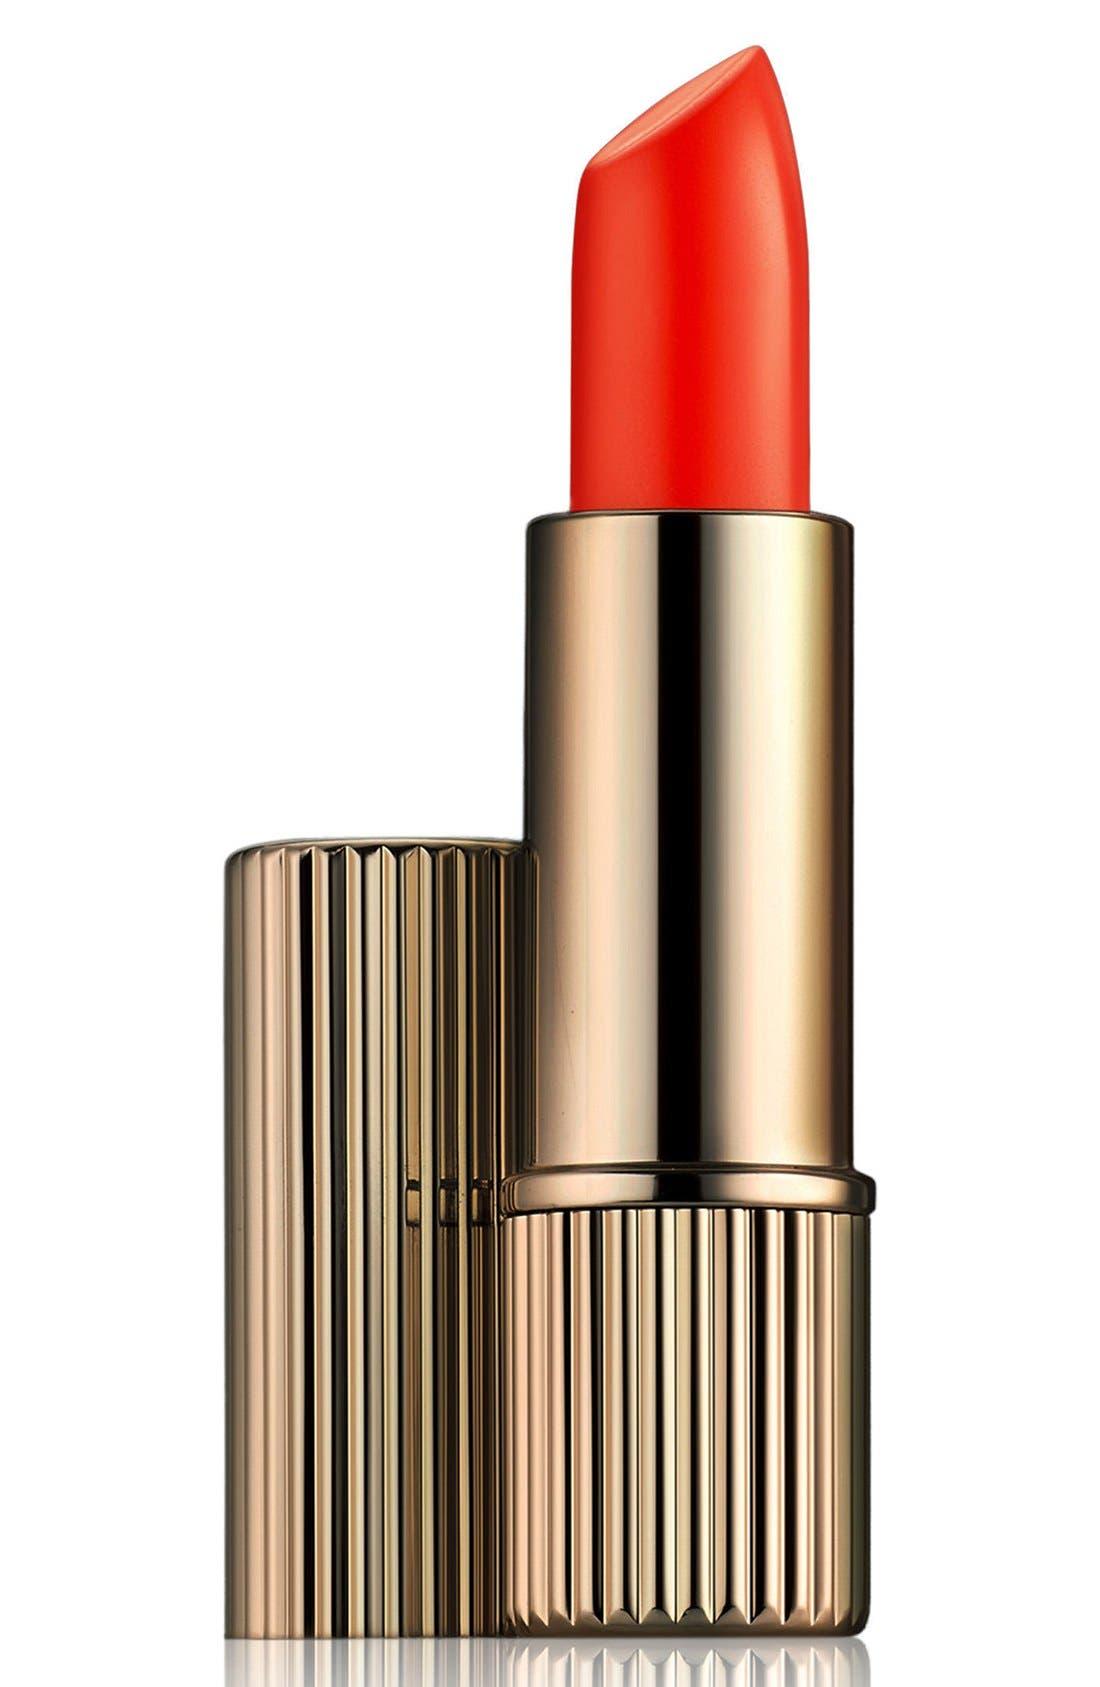 Victoria Beckham Chilean Sunset Lipstick in Gold Case, Main, color, 600